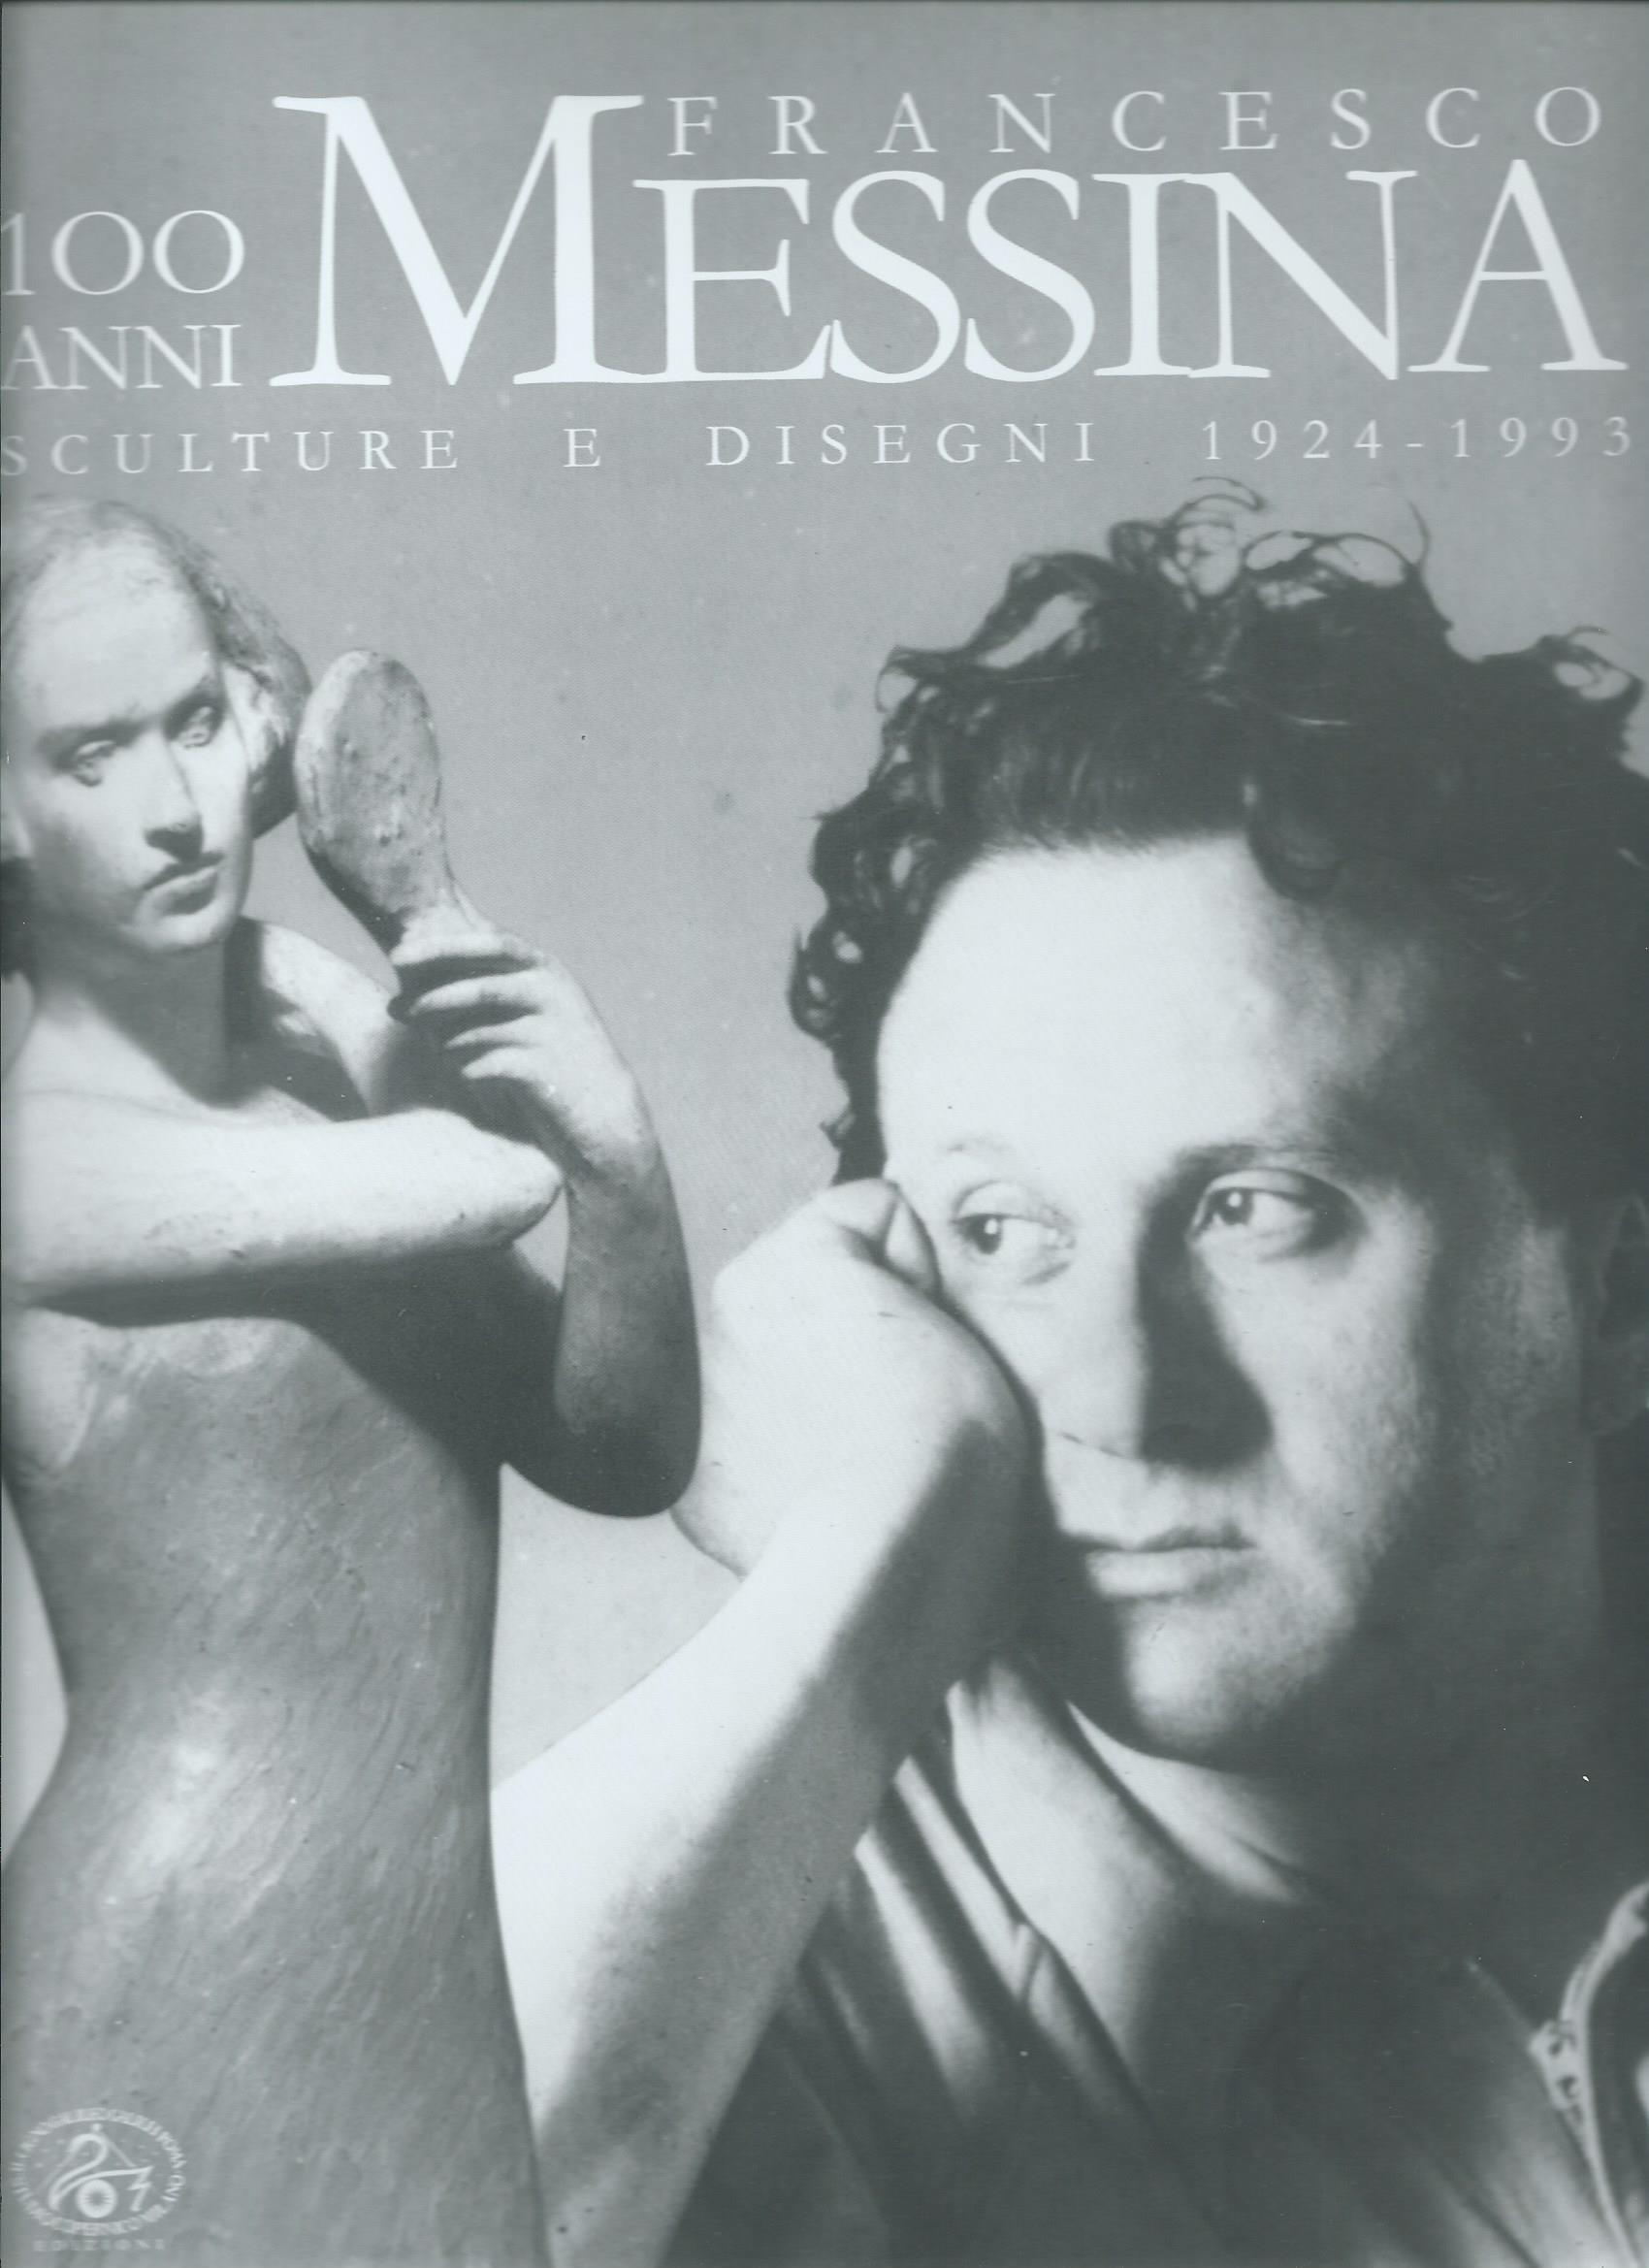 Francesco Messina 10...